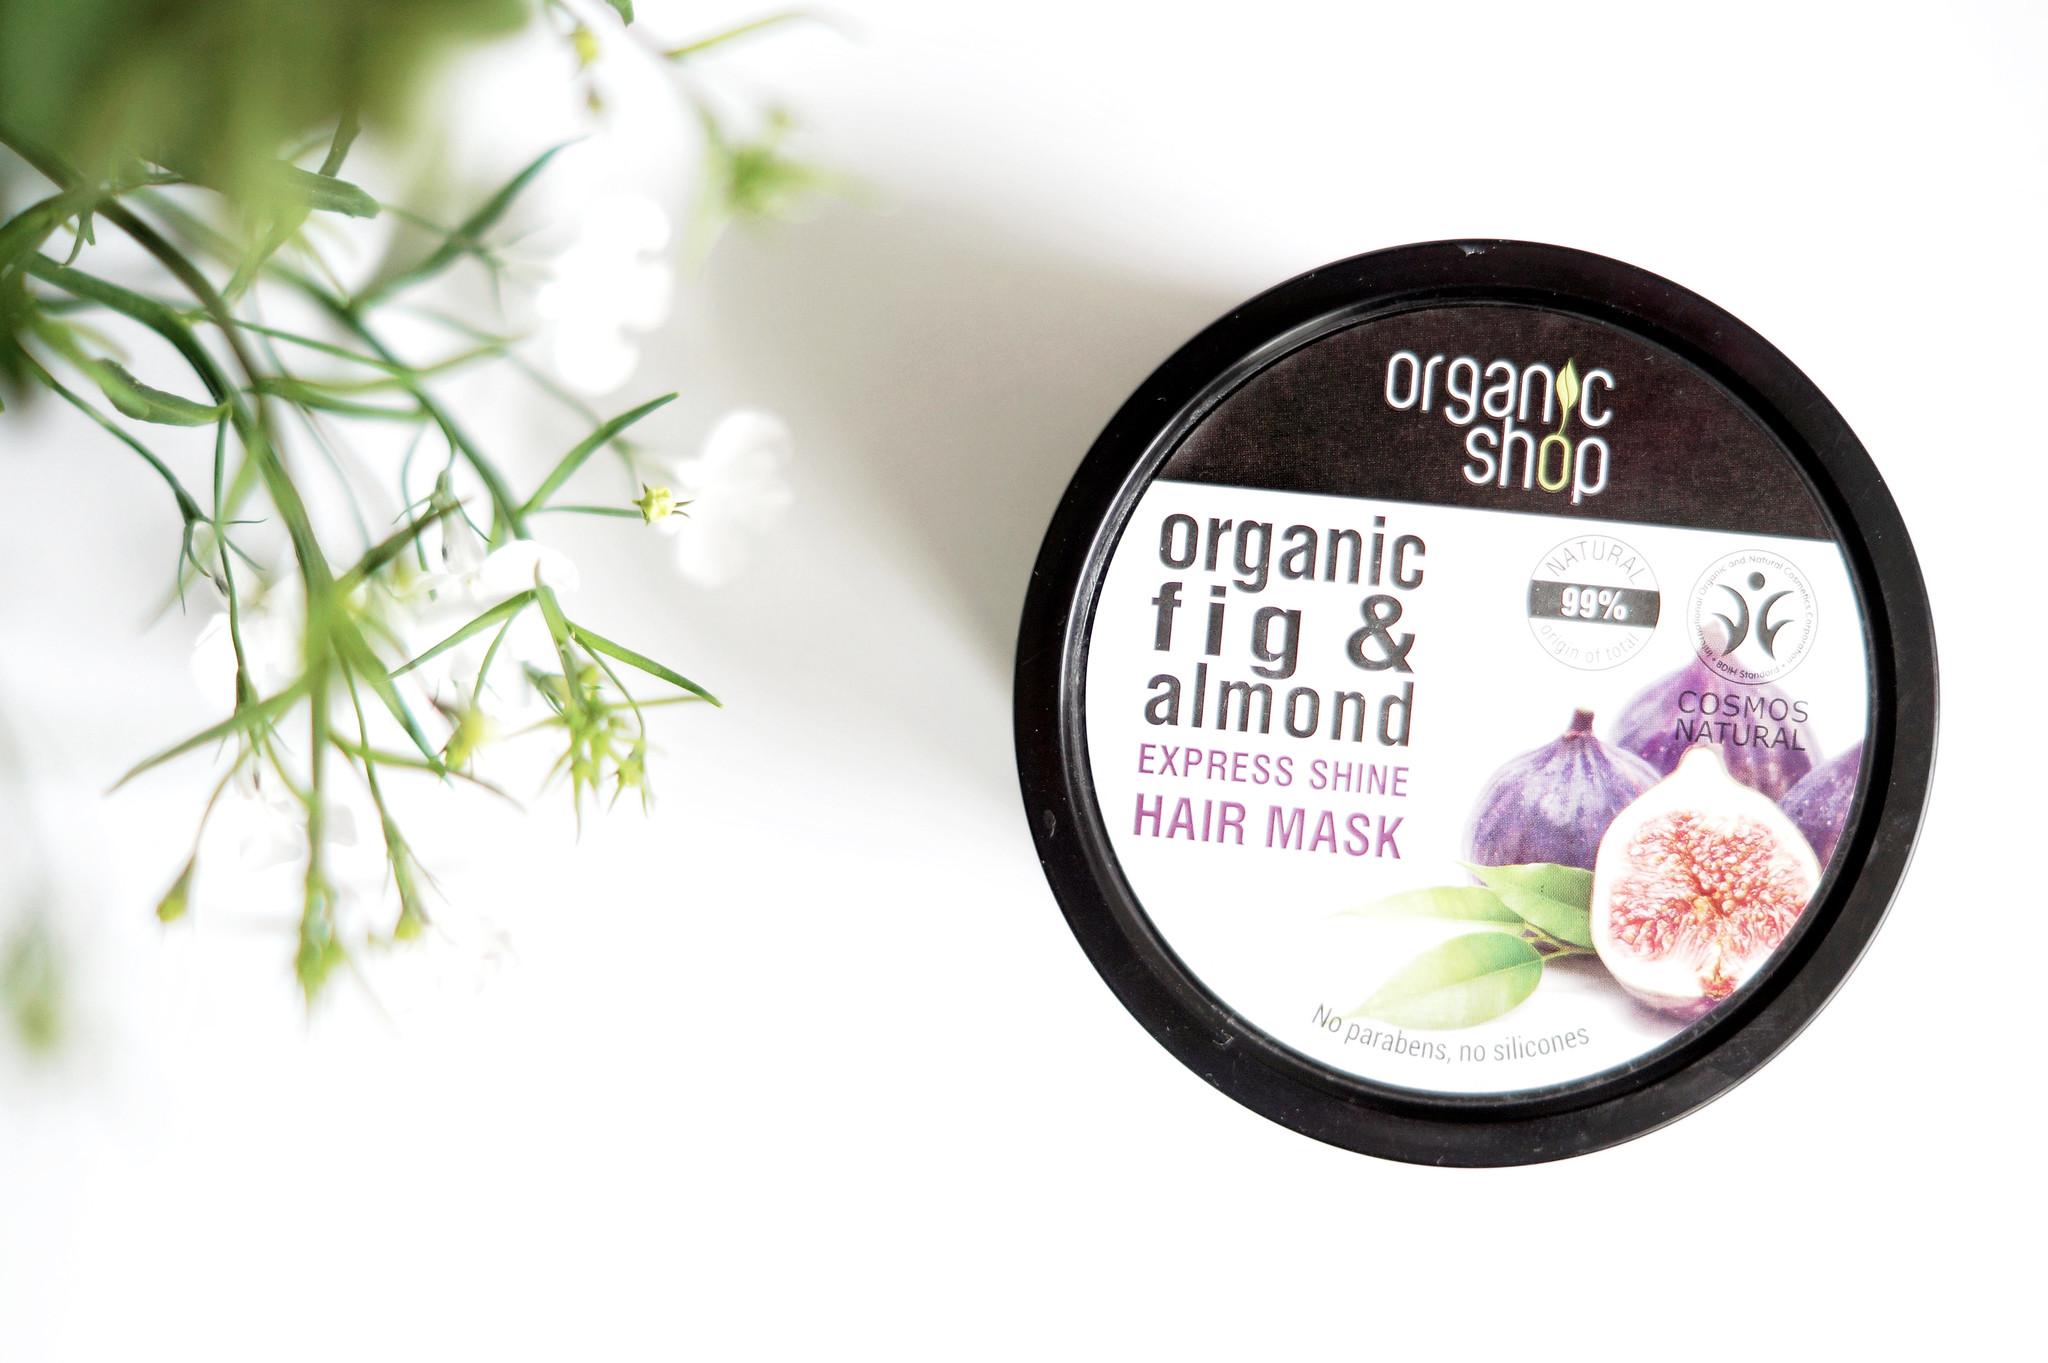 organic shop viikuna hiusnaamio